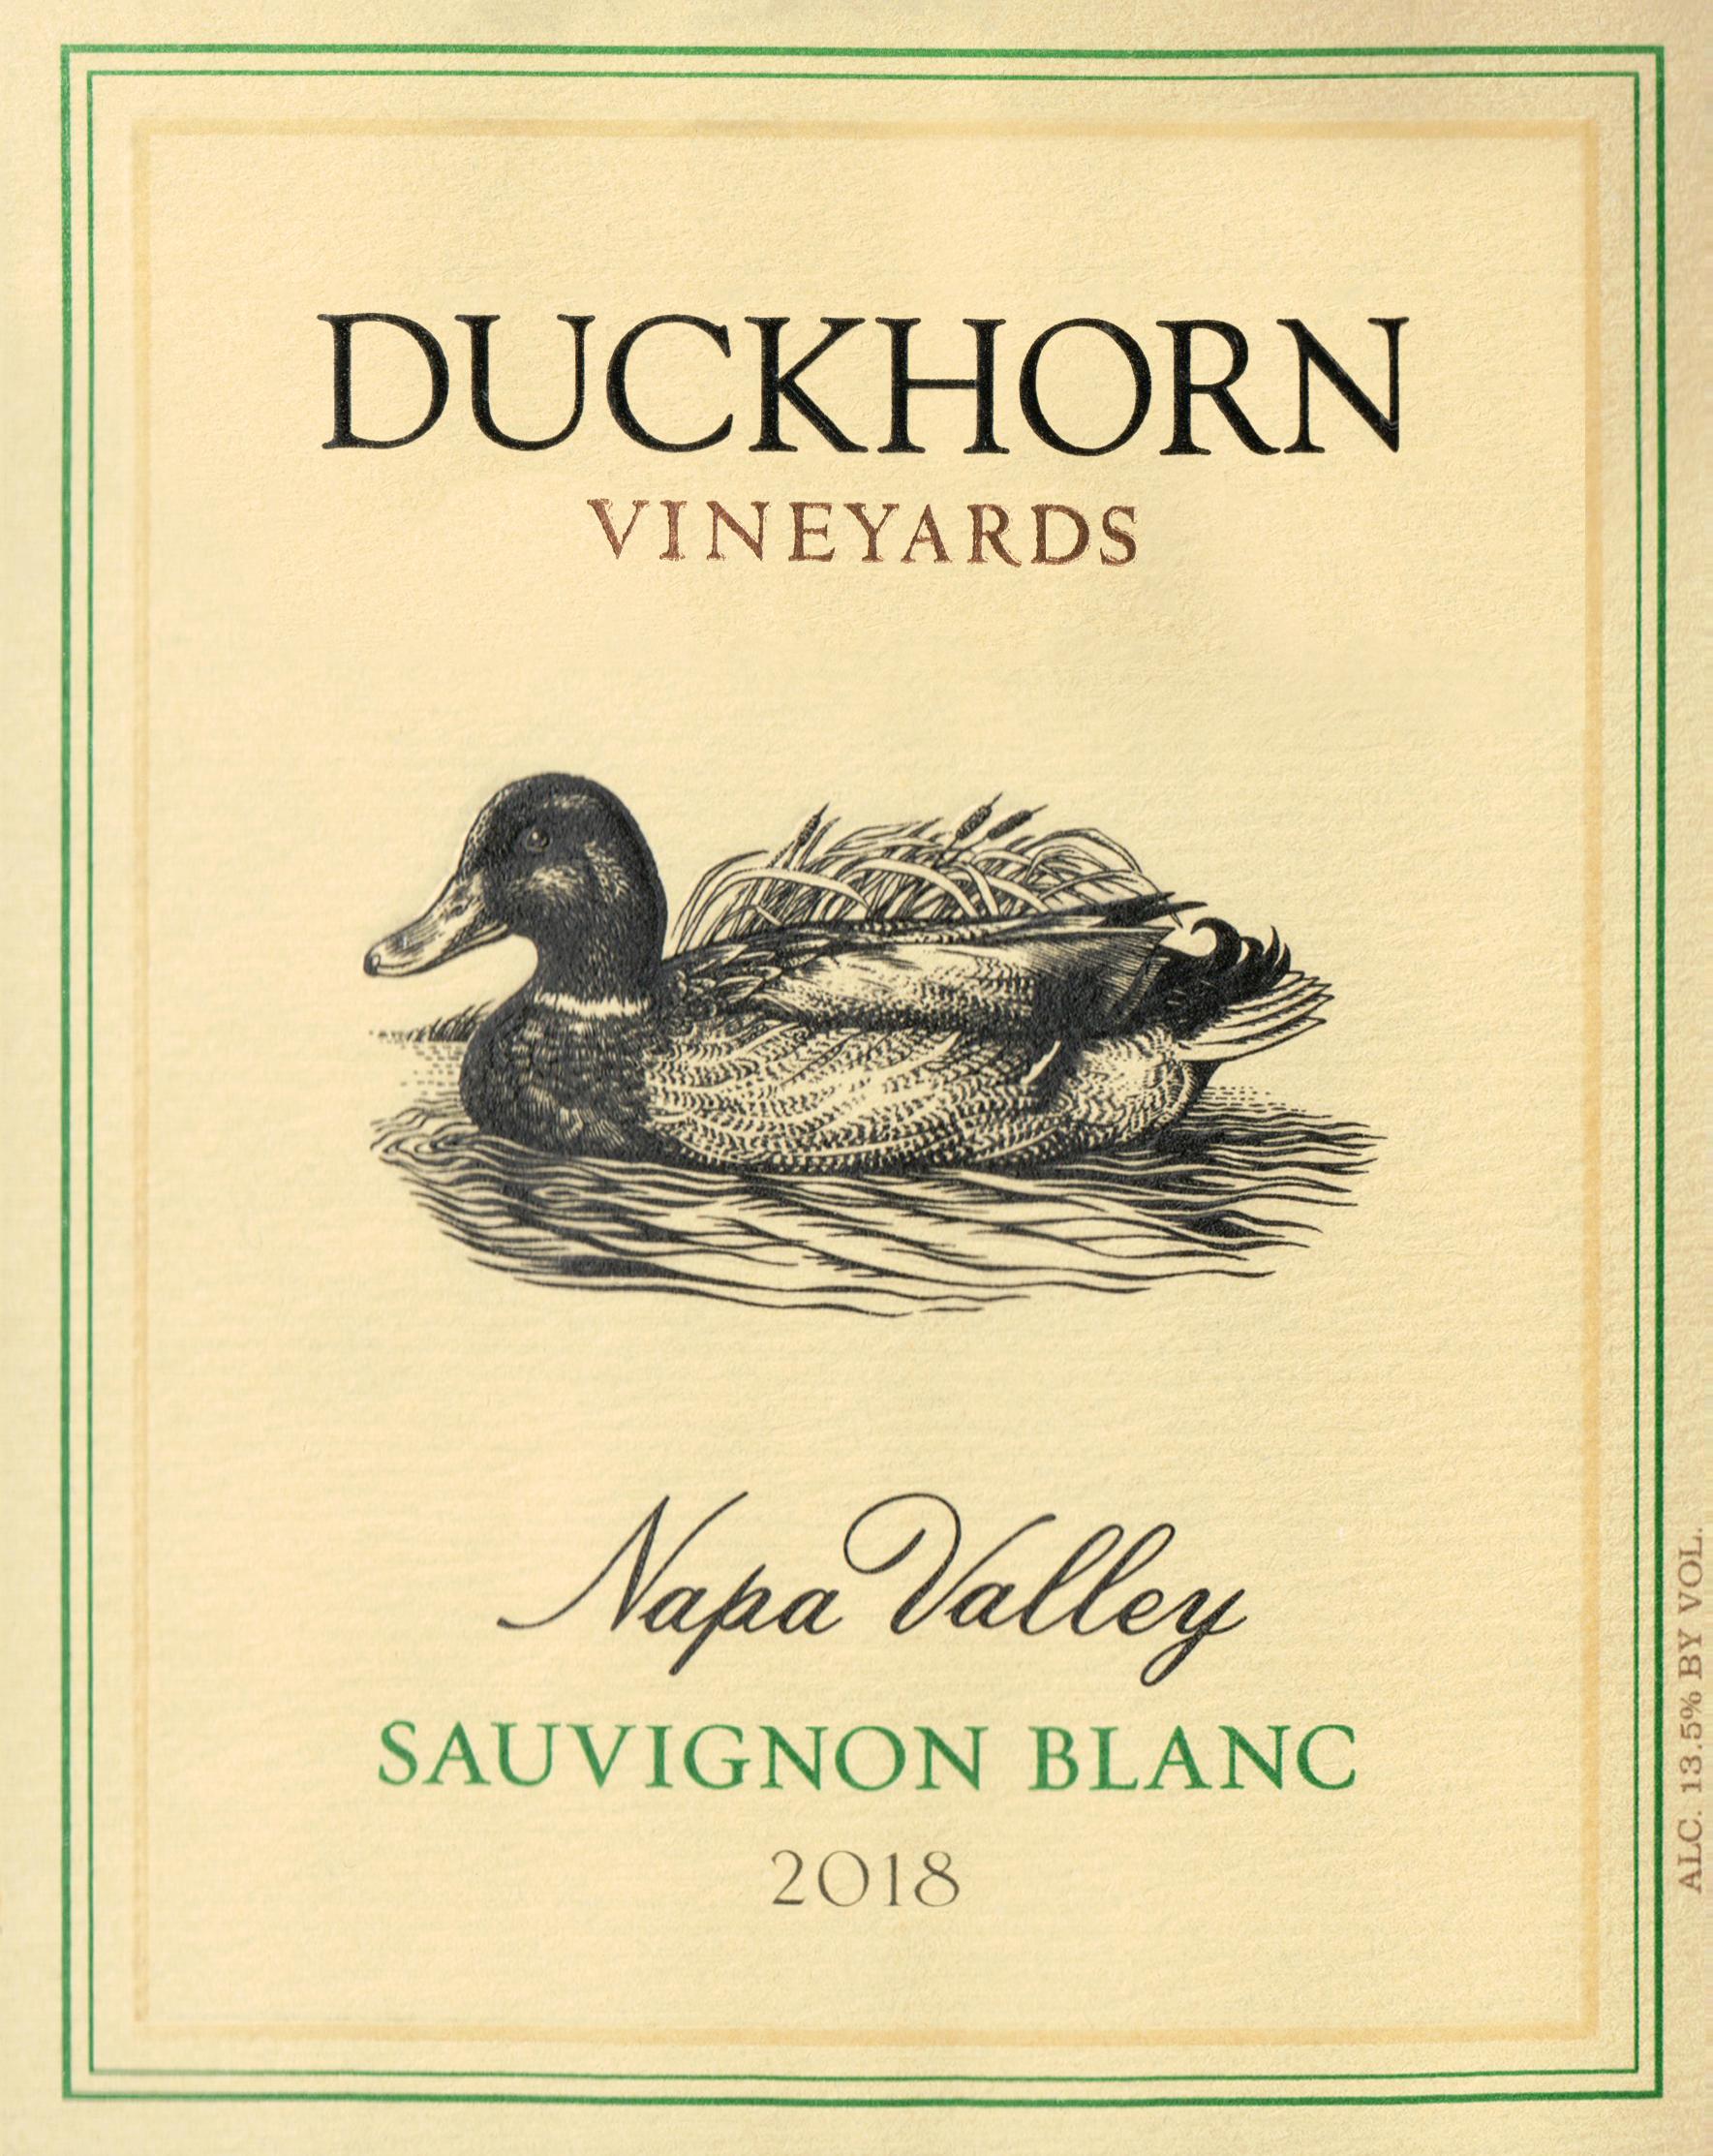 Duckhorn Sauvignon Blanc Half Bottle 2018